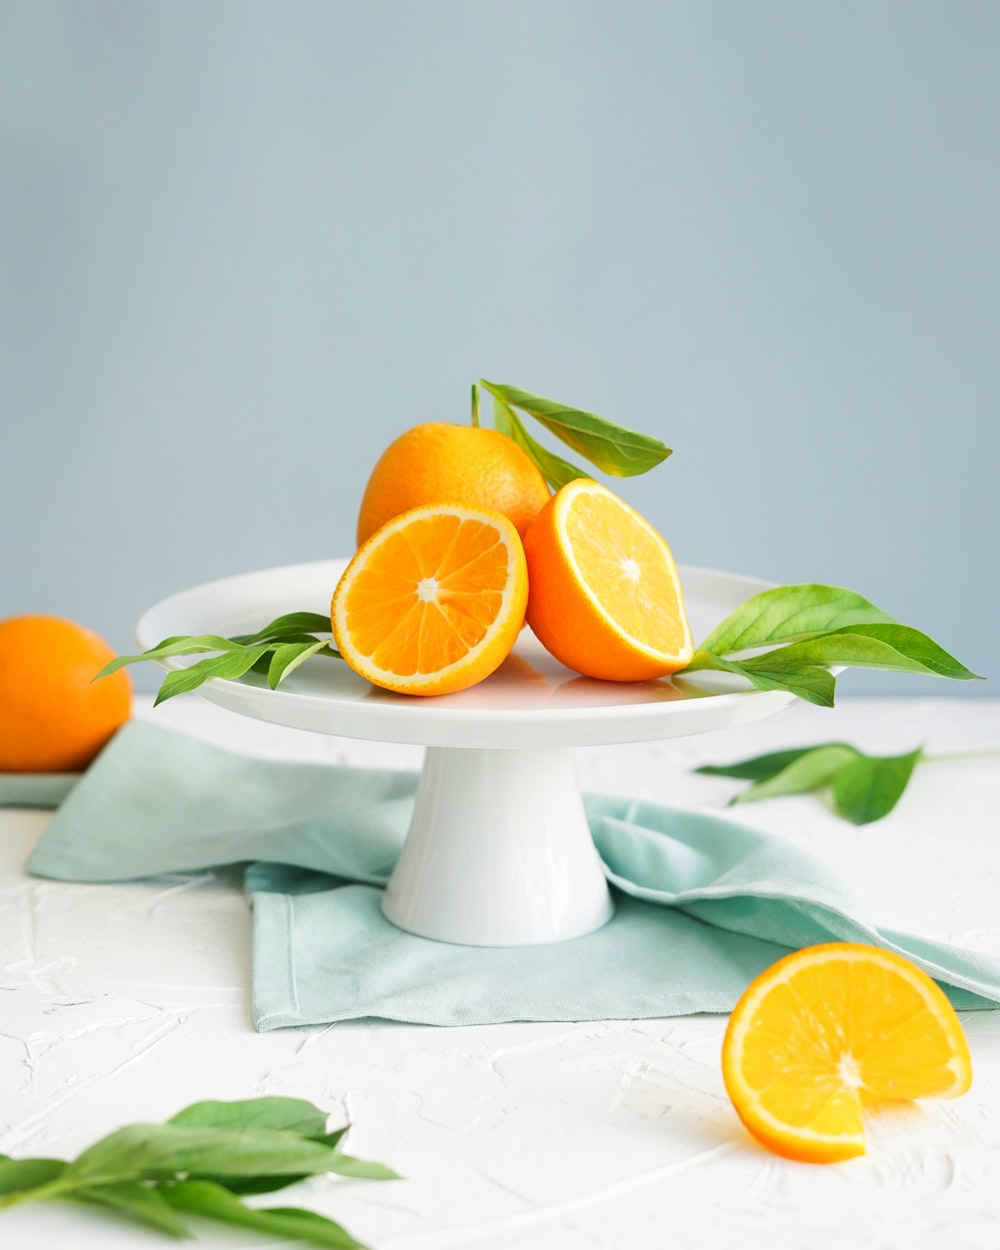 orange fruit in white ceramic plate close-up photography